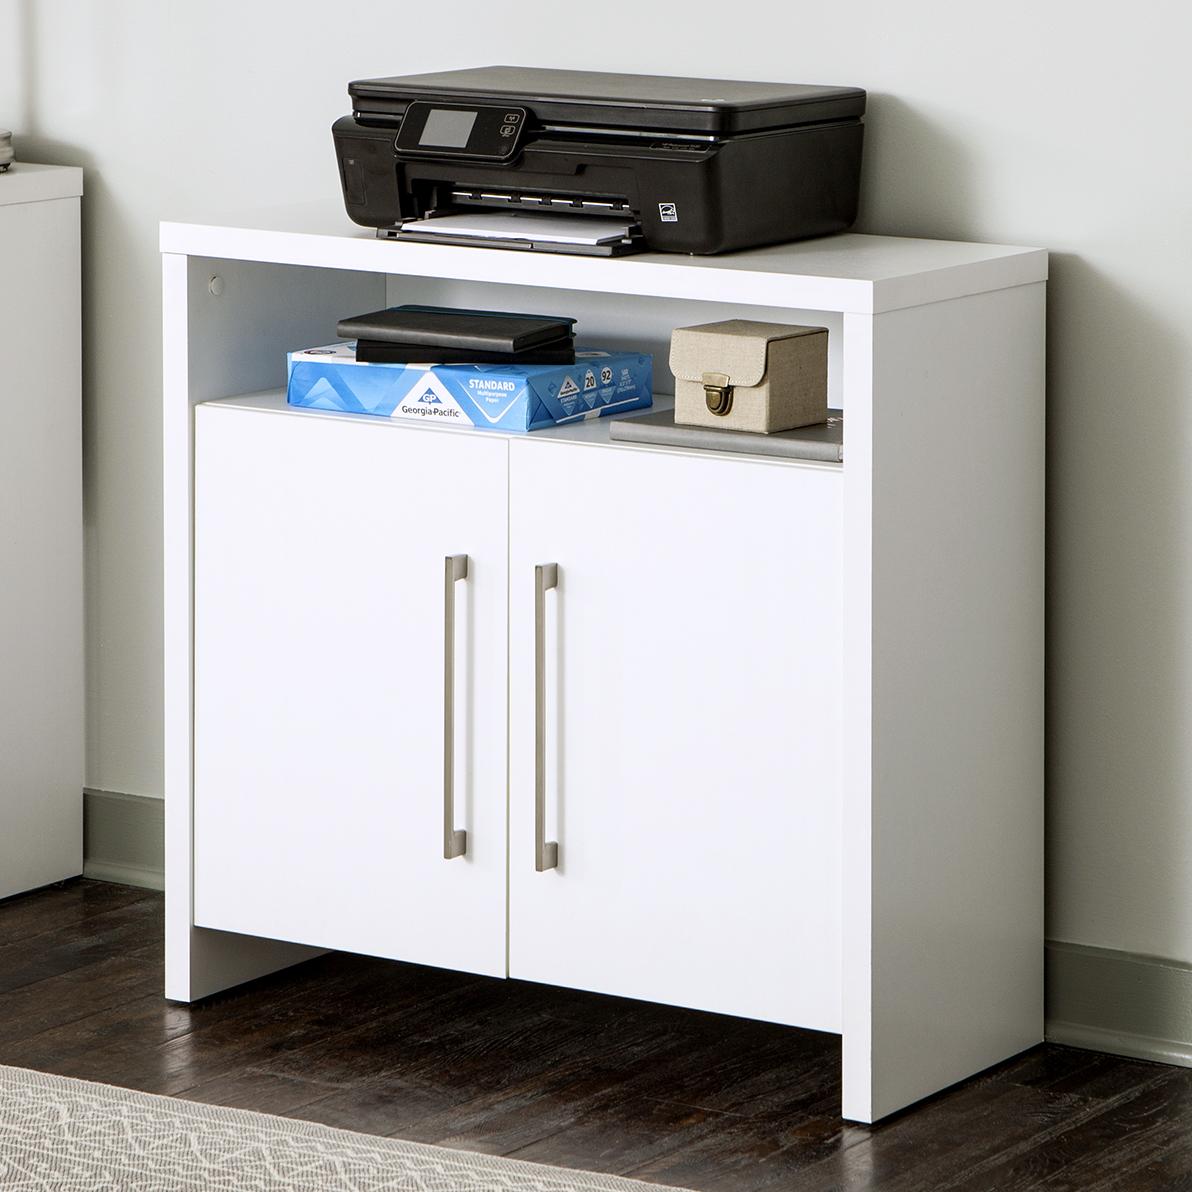 Amazon.com: ClosetMaid 1655 2-Door Storage Cabinet with ...